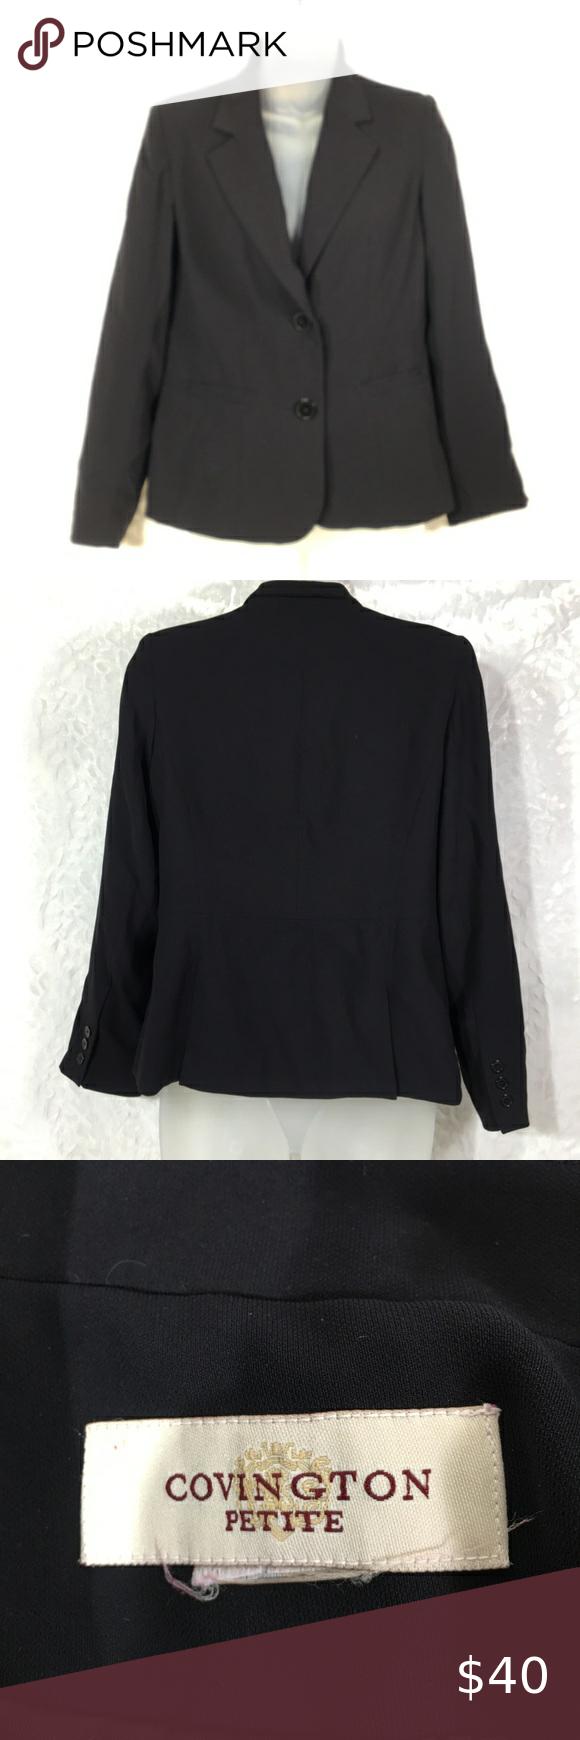 Covington Petite Medium Black Blazer Coat Jacket Black Blazer Coat Jacket Size Petite Medium See Pictu Black Blazer Coat Blazer Coat Blazer Jackets For Women [ 1740 x 580 Pixel ]